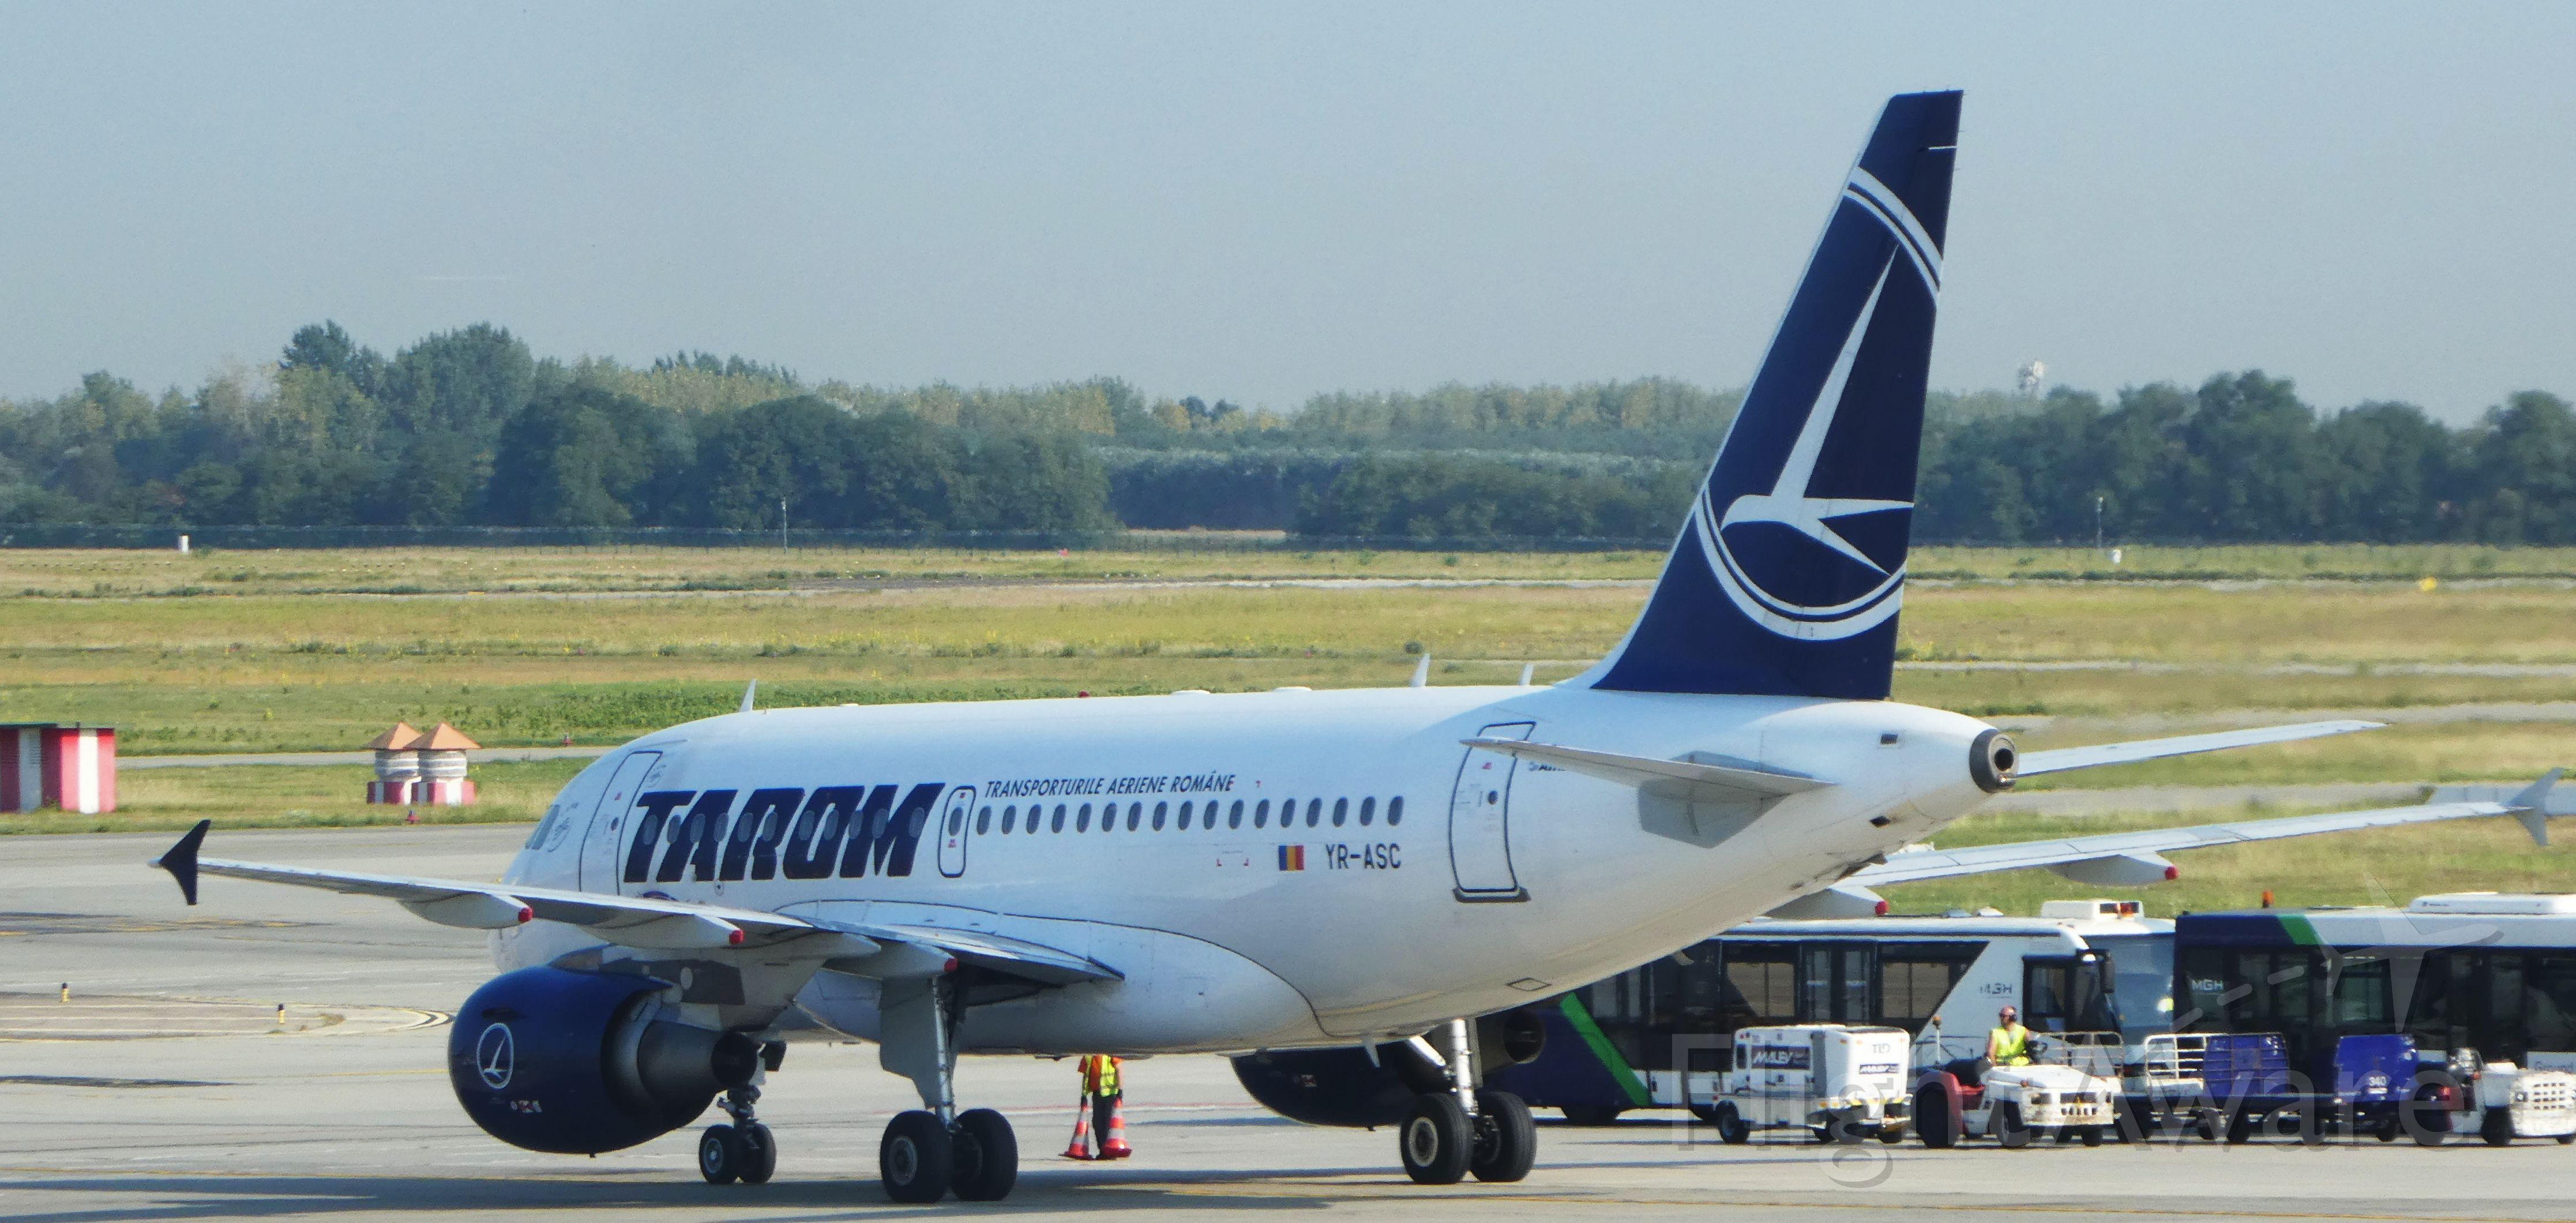 Airbus A318 (YR-ASC)